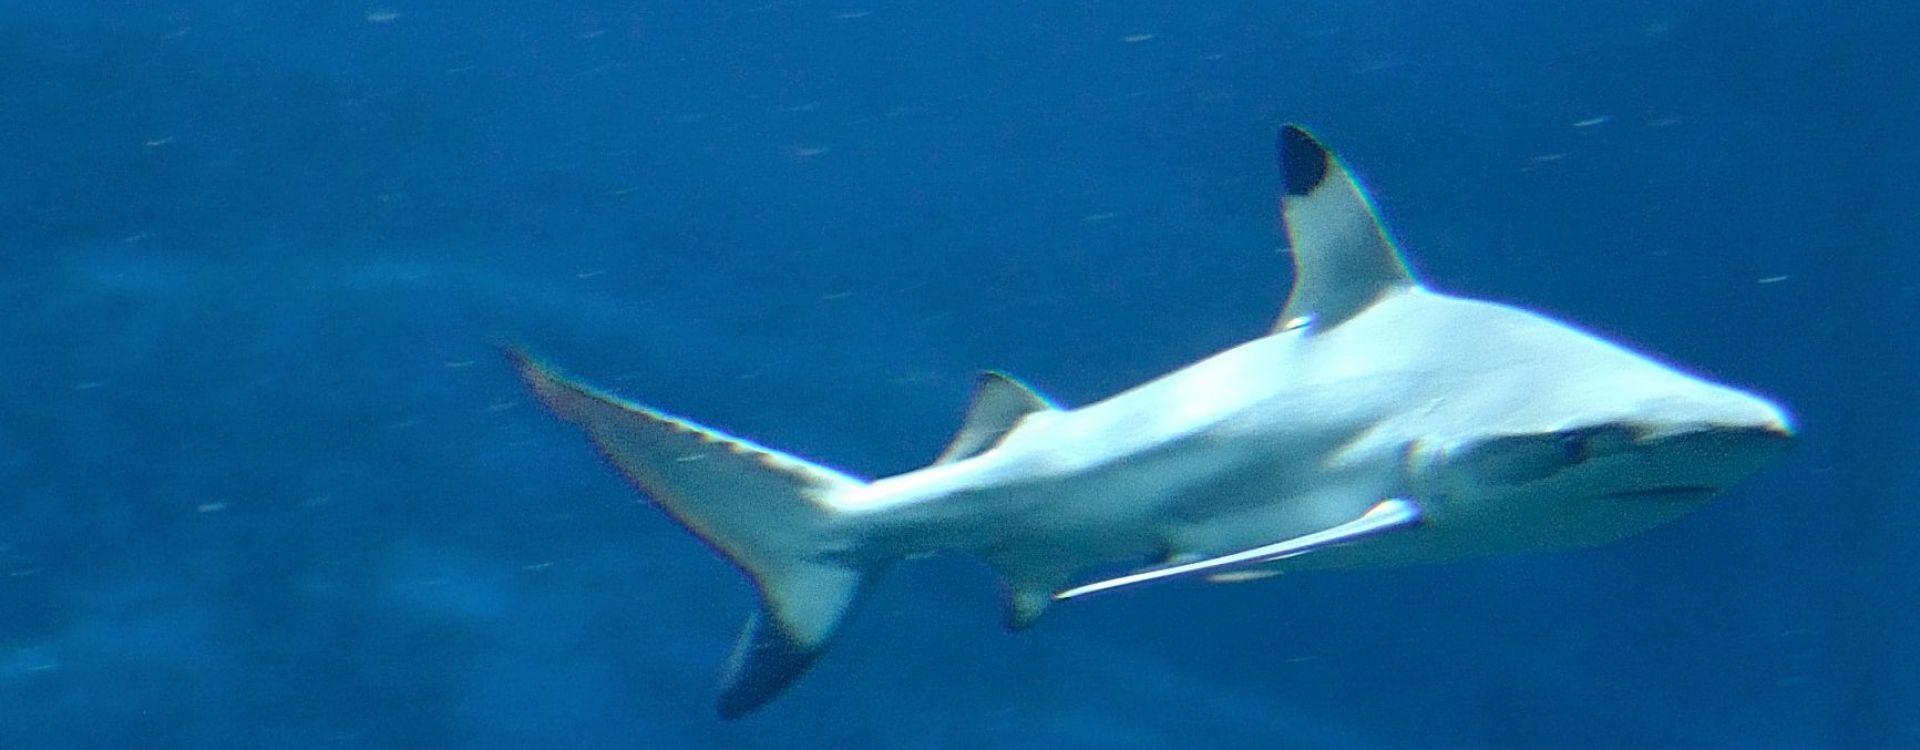 Requins ! S.O.S. Espèces menacées